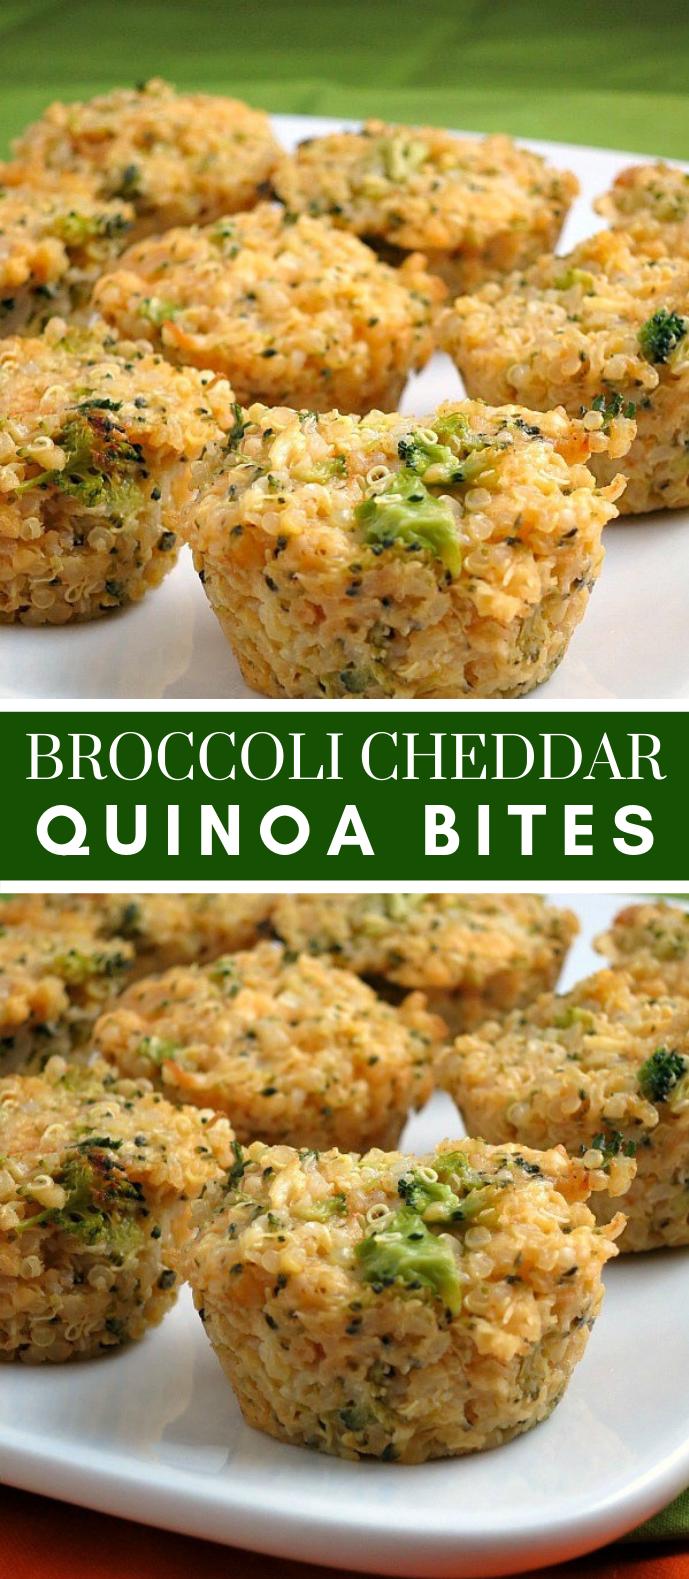 Photo of Broccoli Cheddar Quinoa Bites #gluten free #foods – recipes – #Bites #Br …